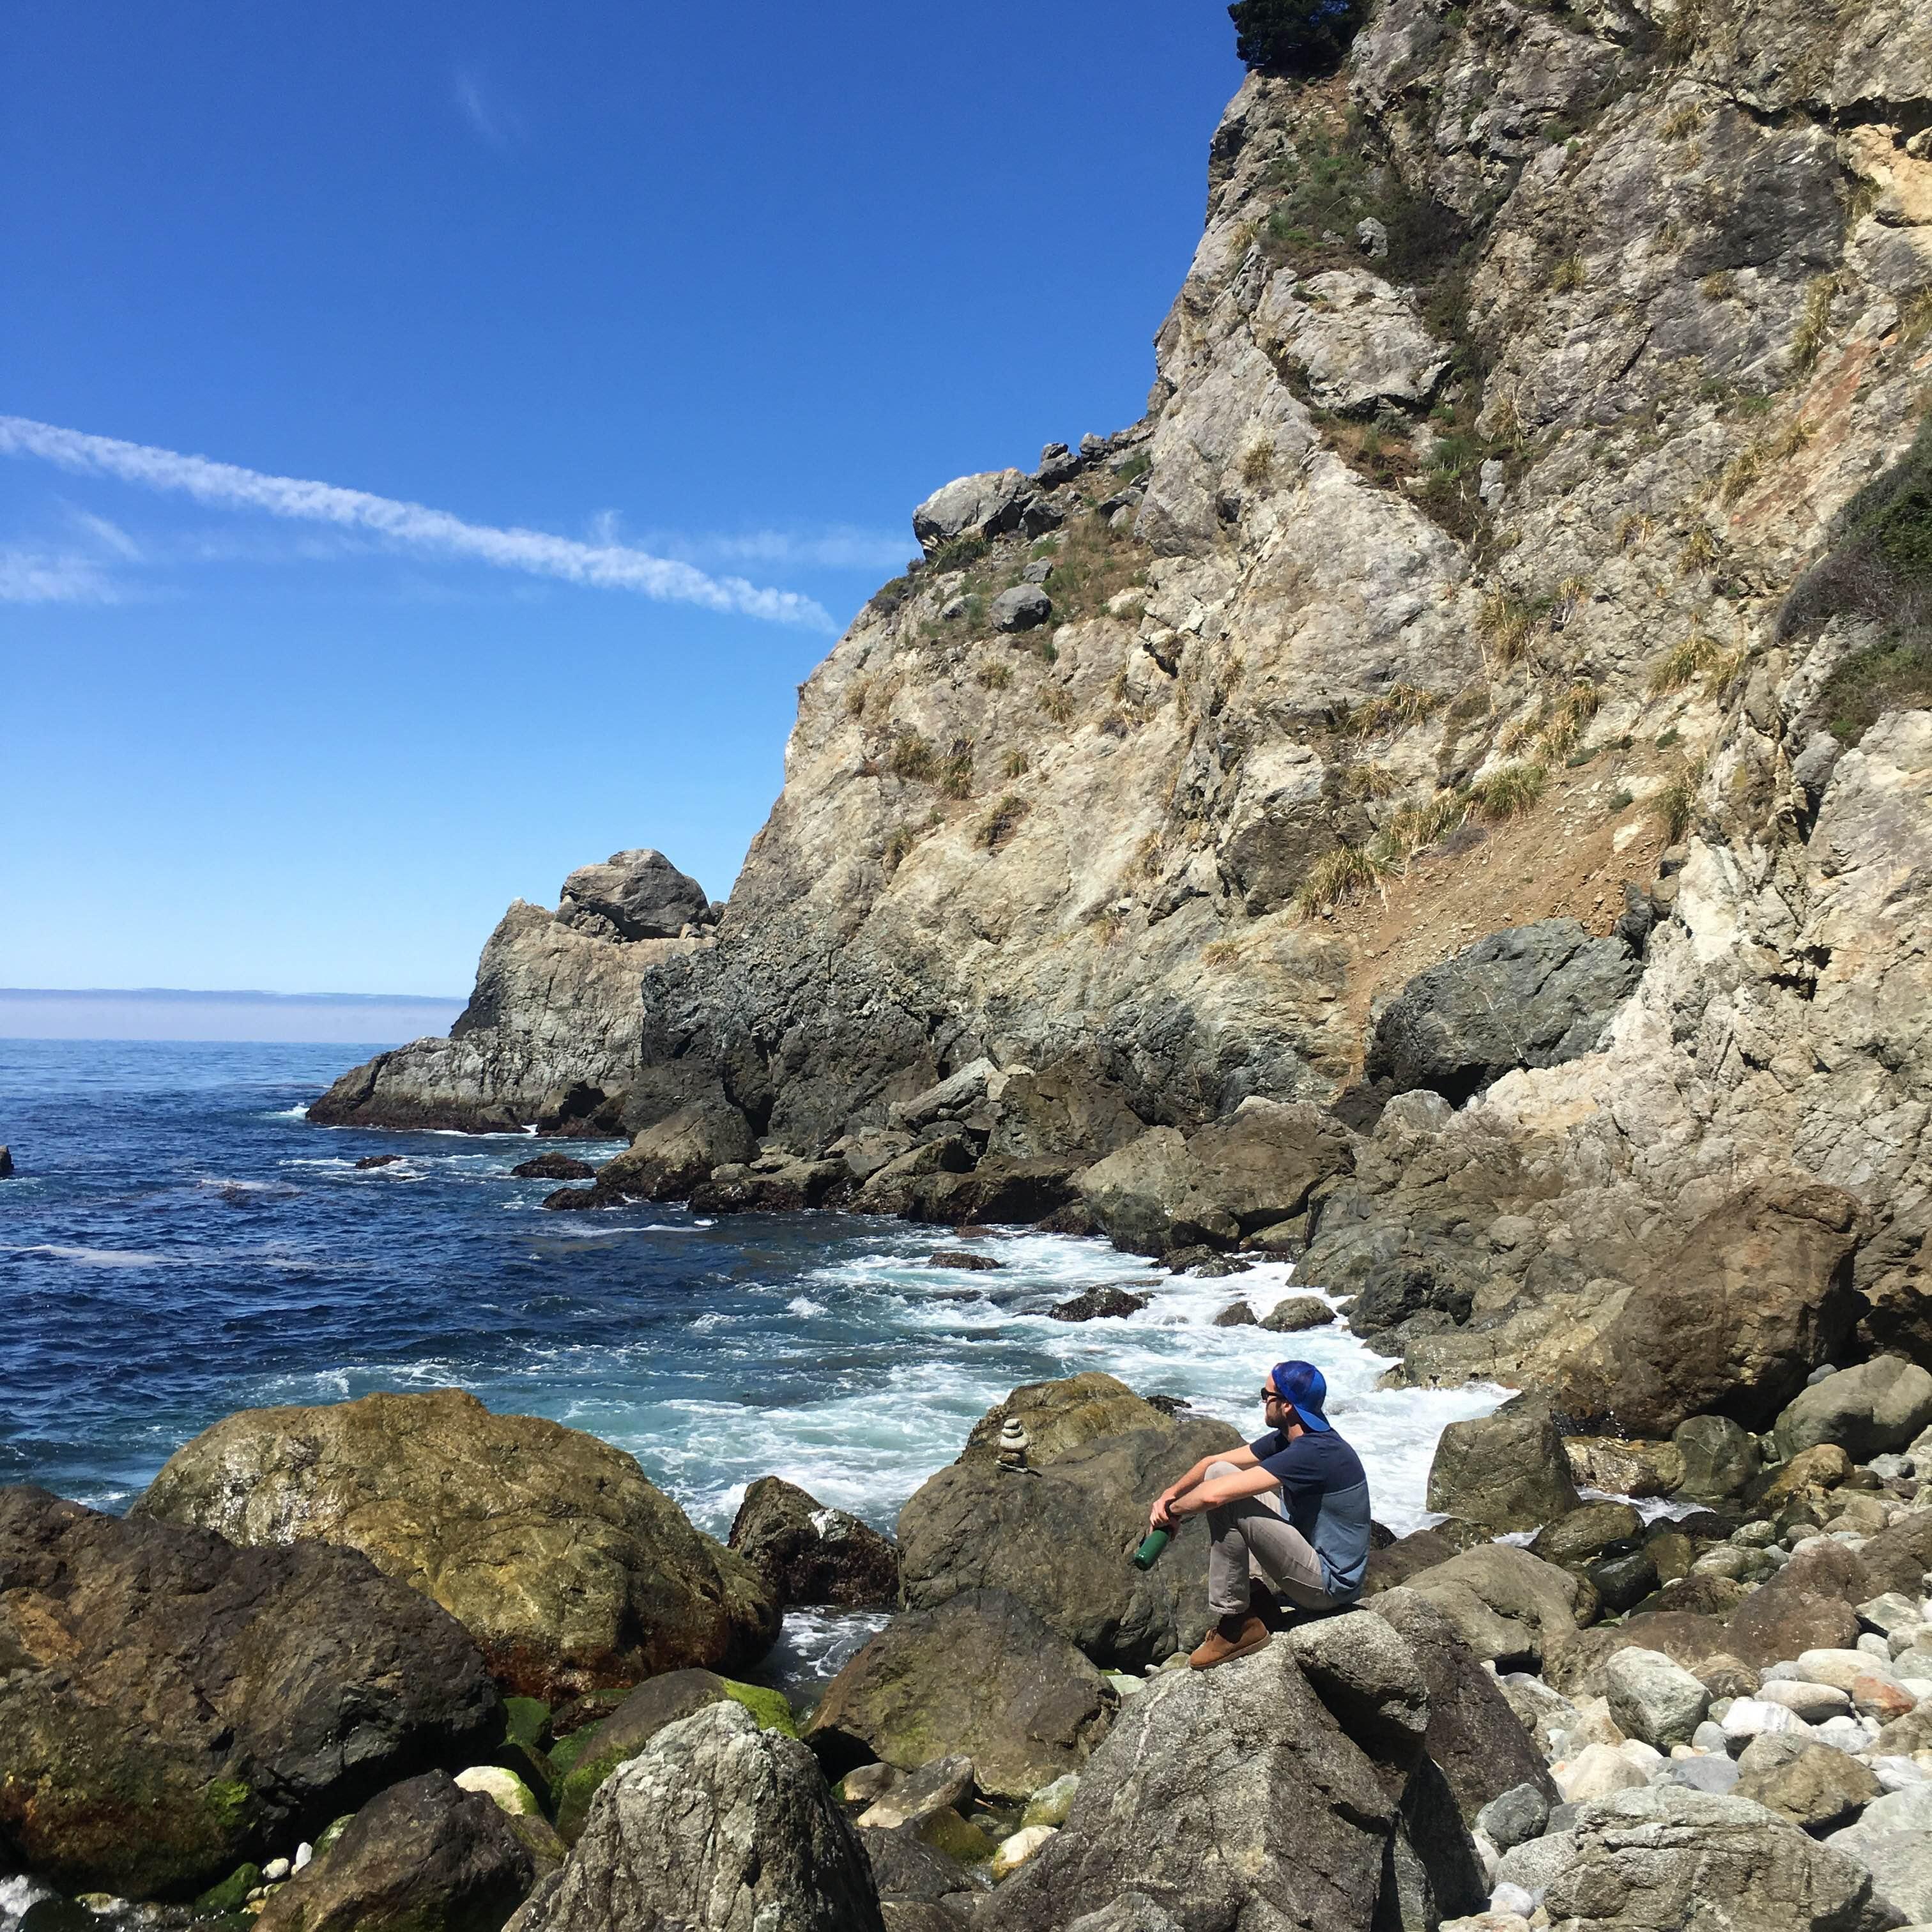 #GrabYourMoment Monterey - 1